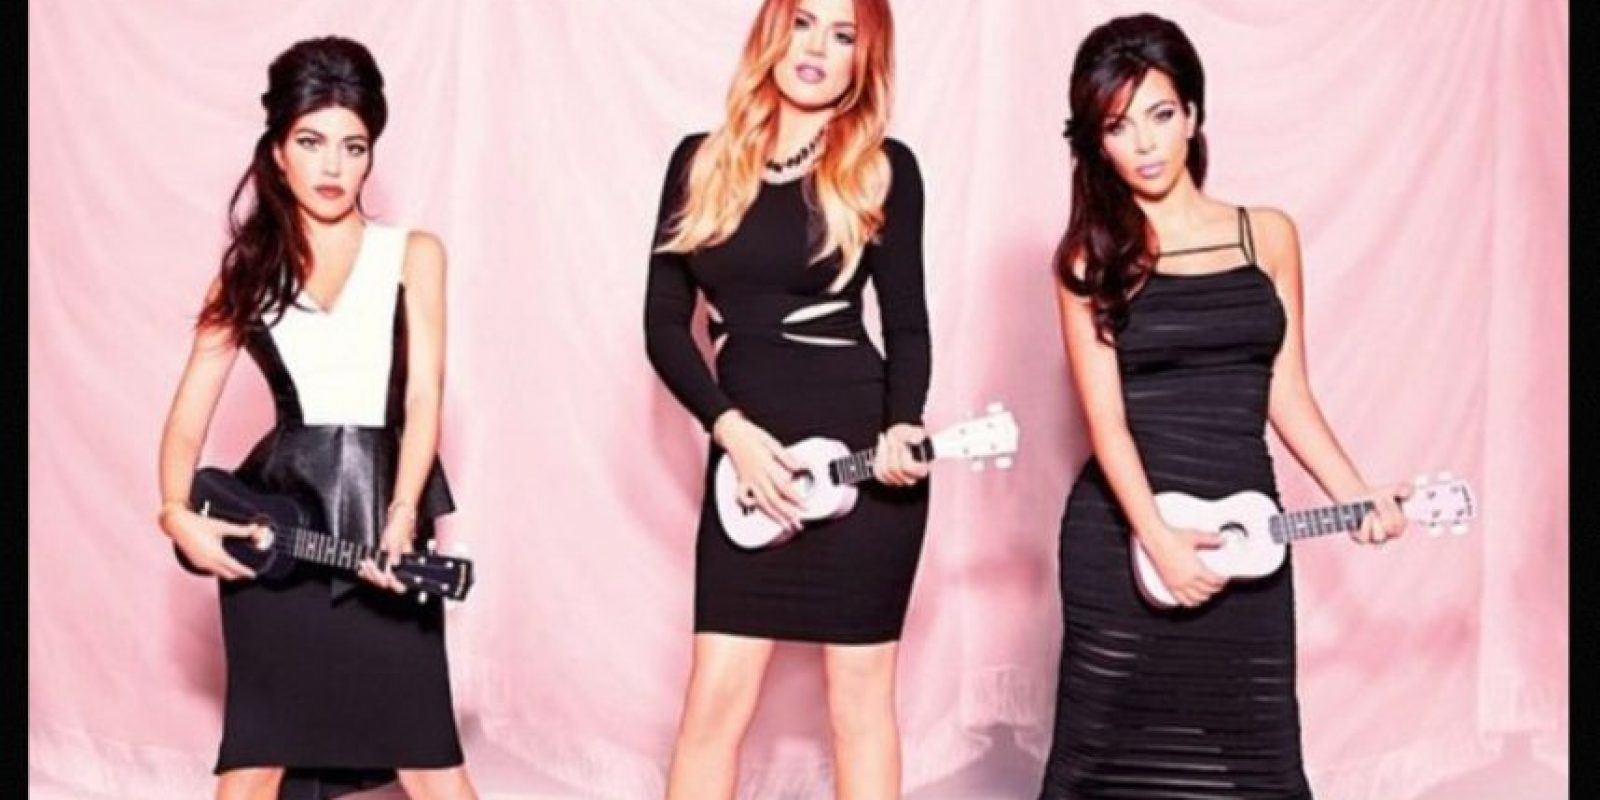 En 2014, Kim Kardashian cobró cerca de 28 millones de dólares. Foto:Getty Images